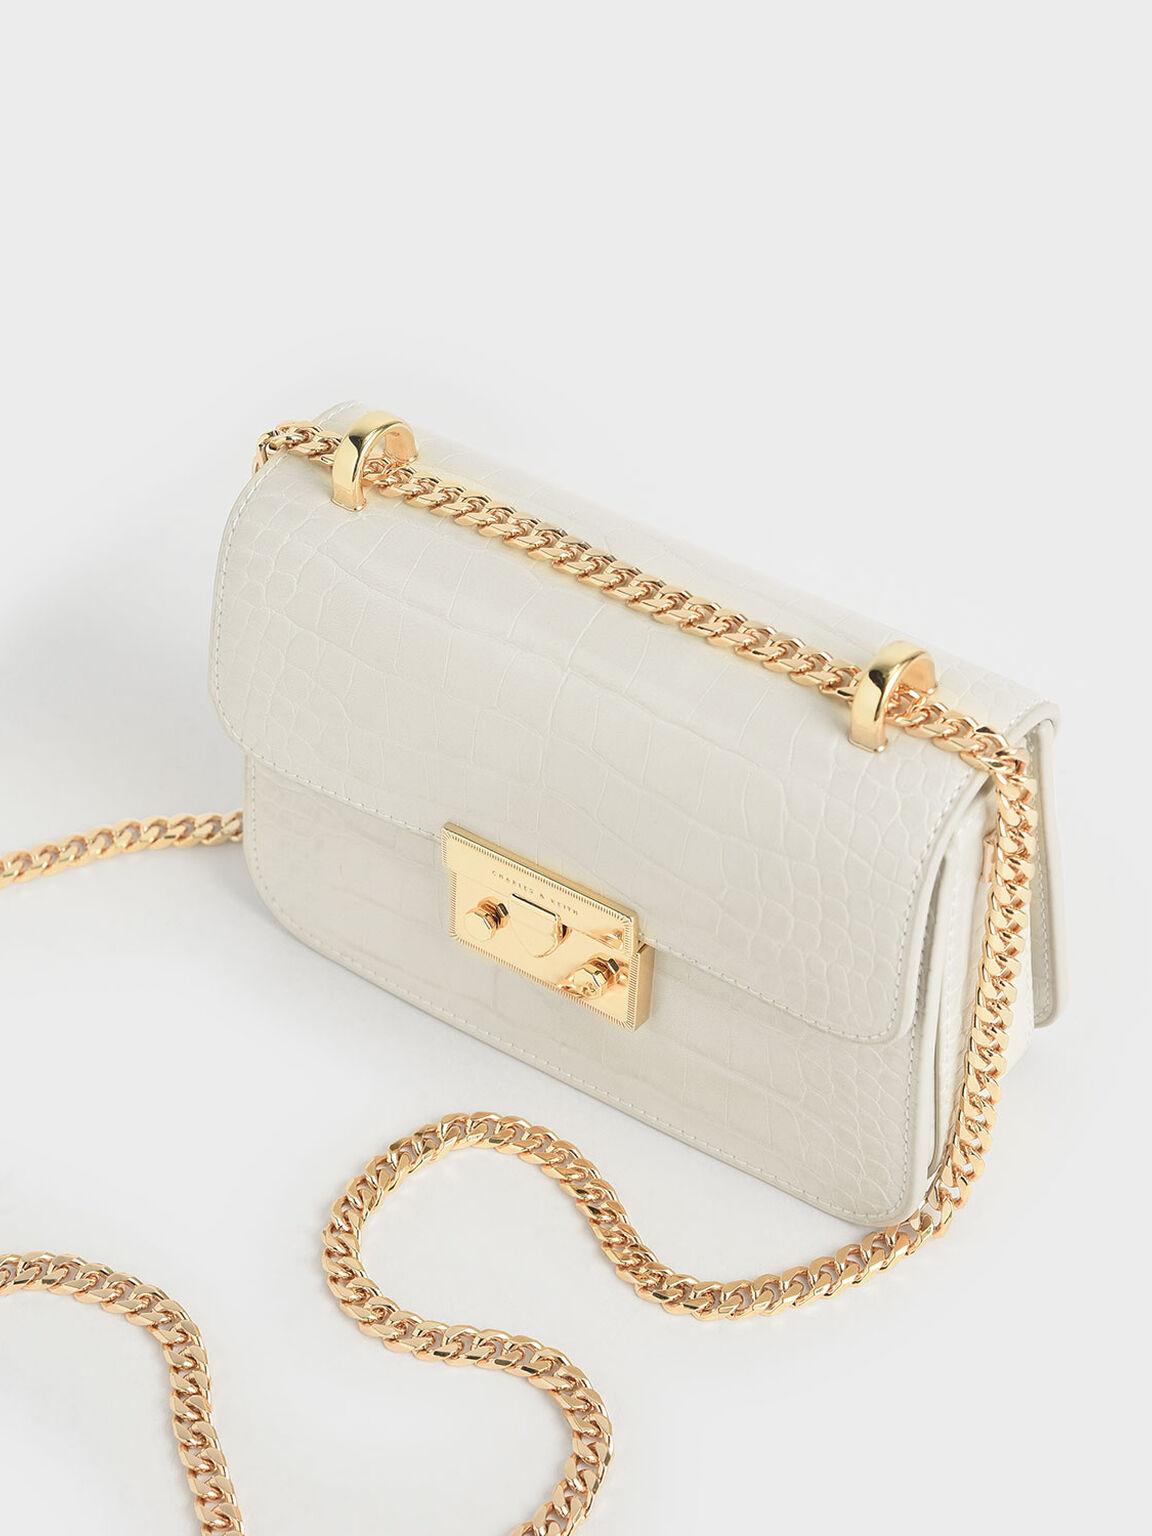 Croc-Effect Chain Strap Crossbody Bag, Chalk, hi-res